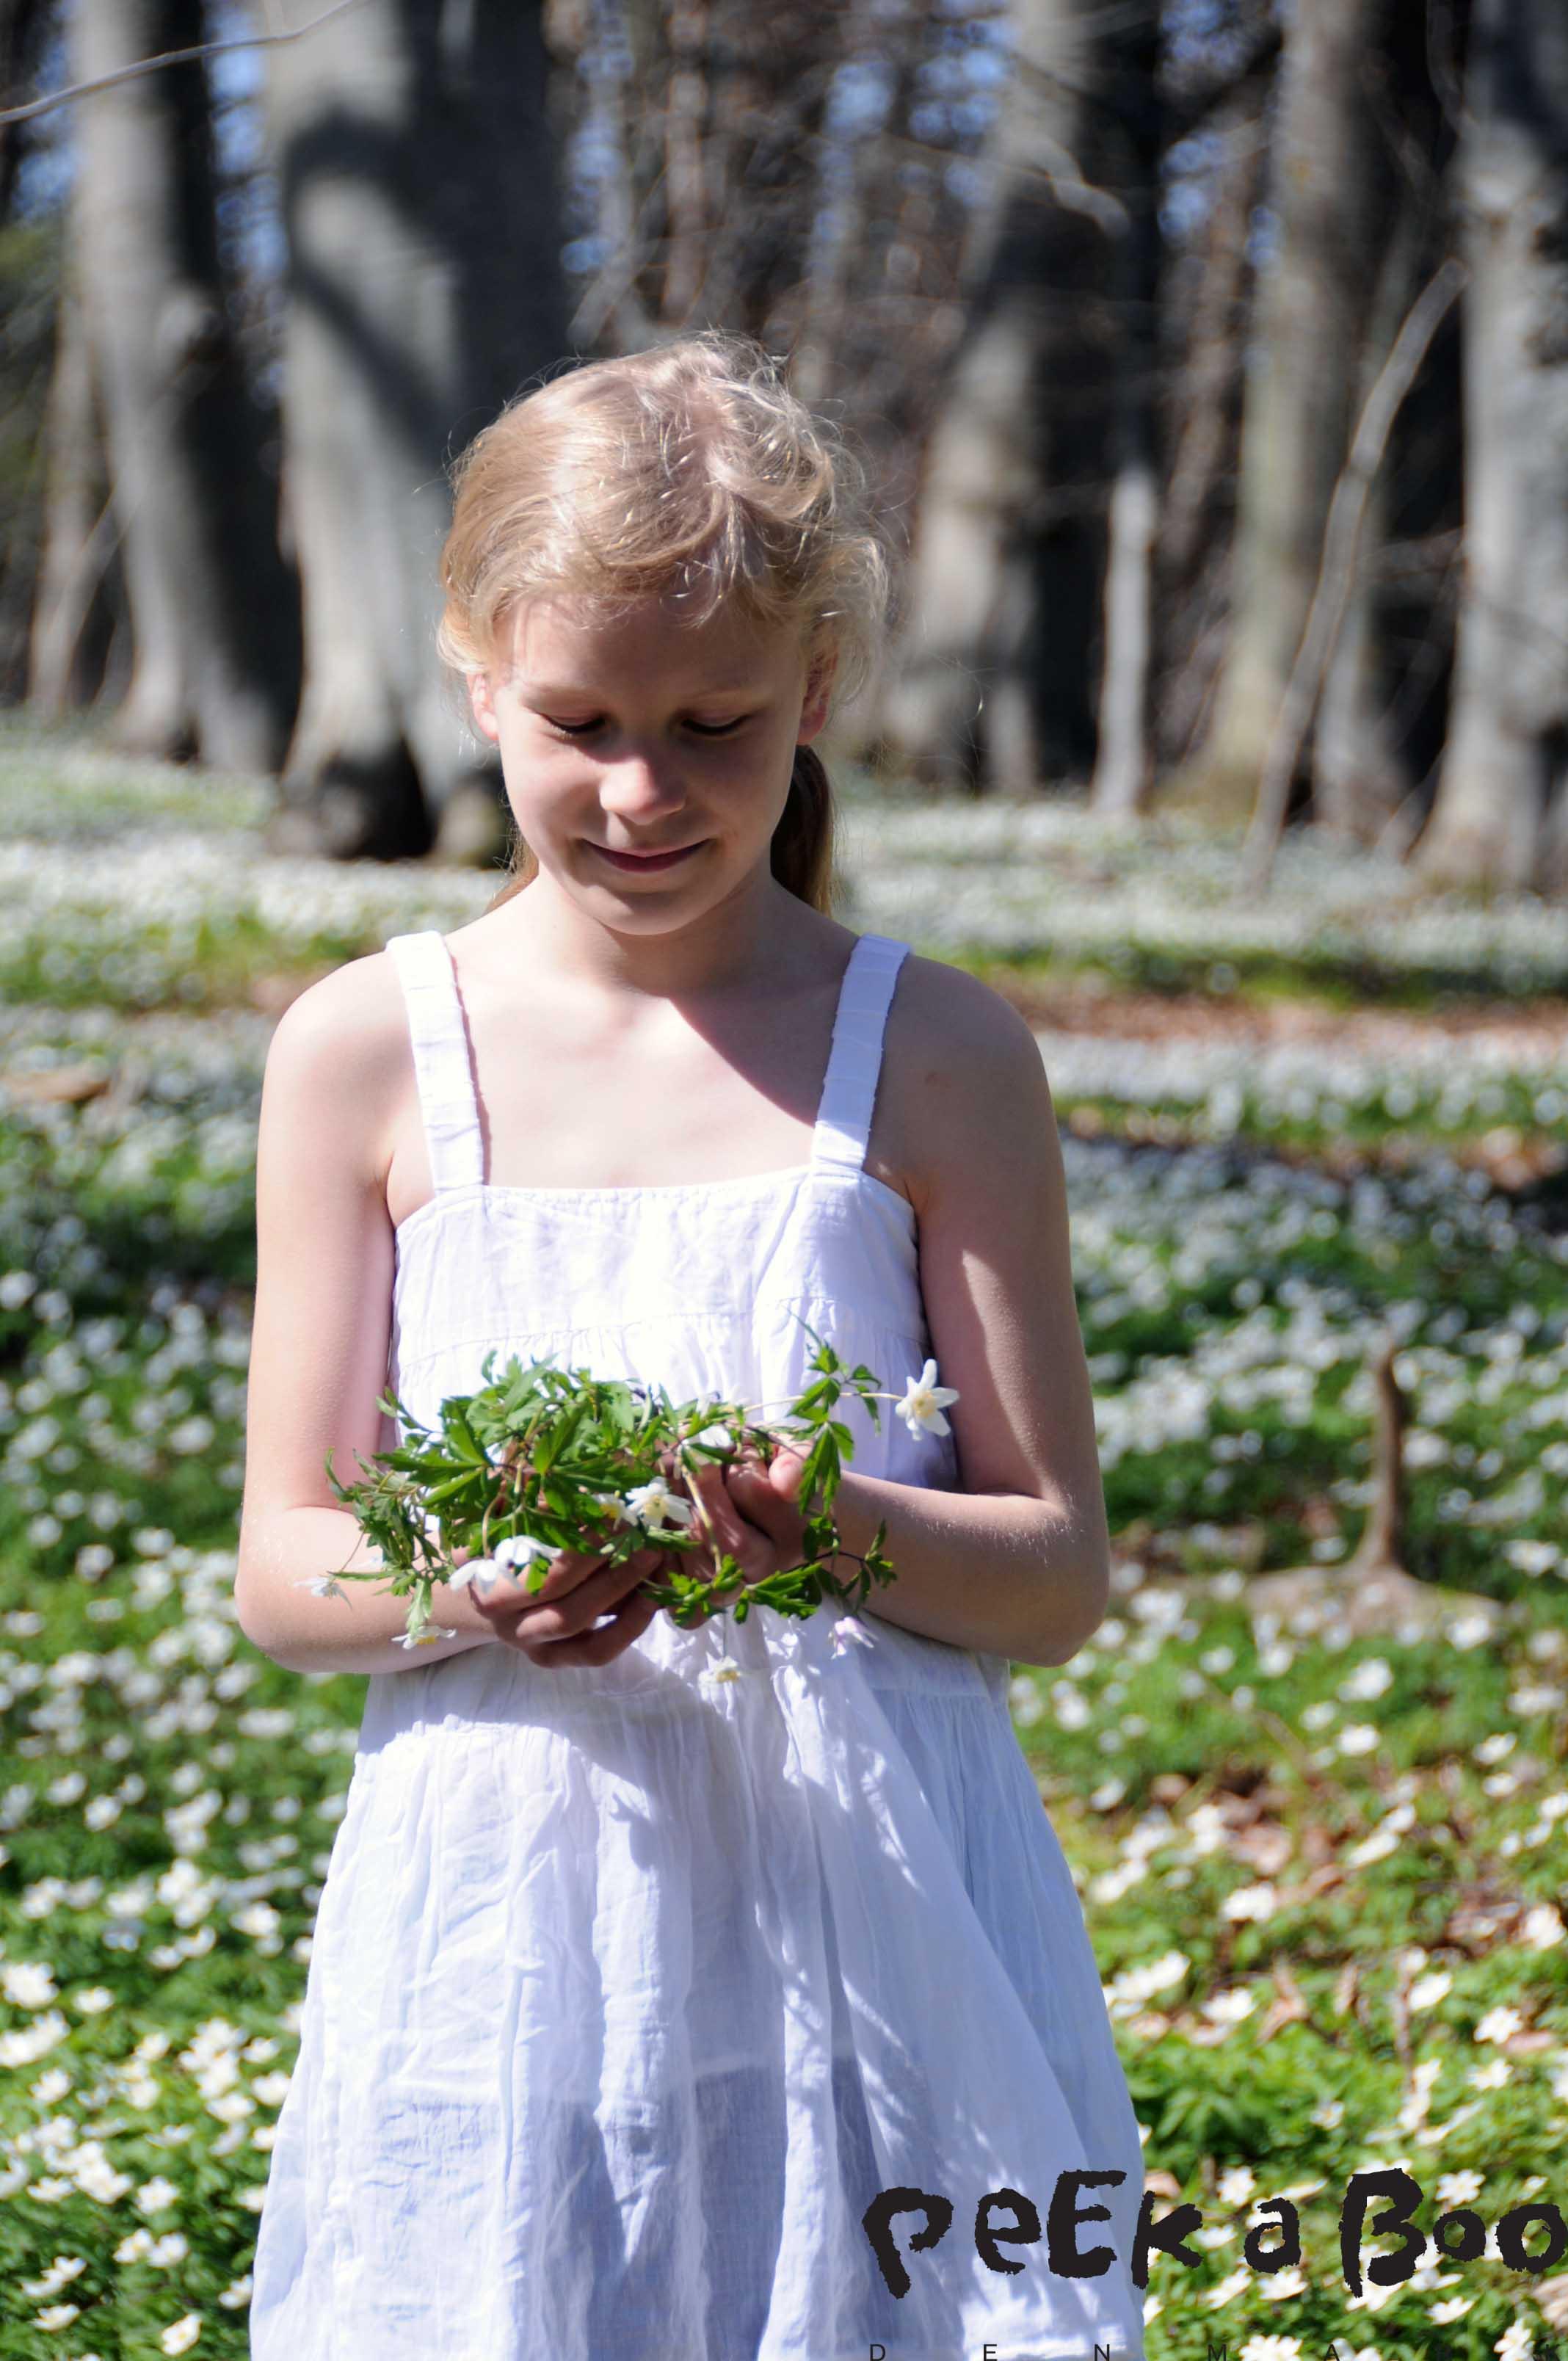 Ella and the anemones.